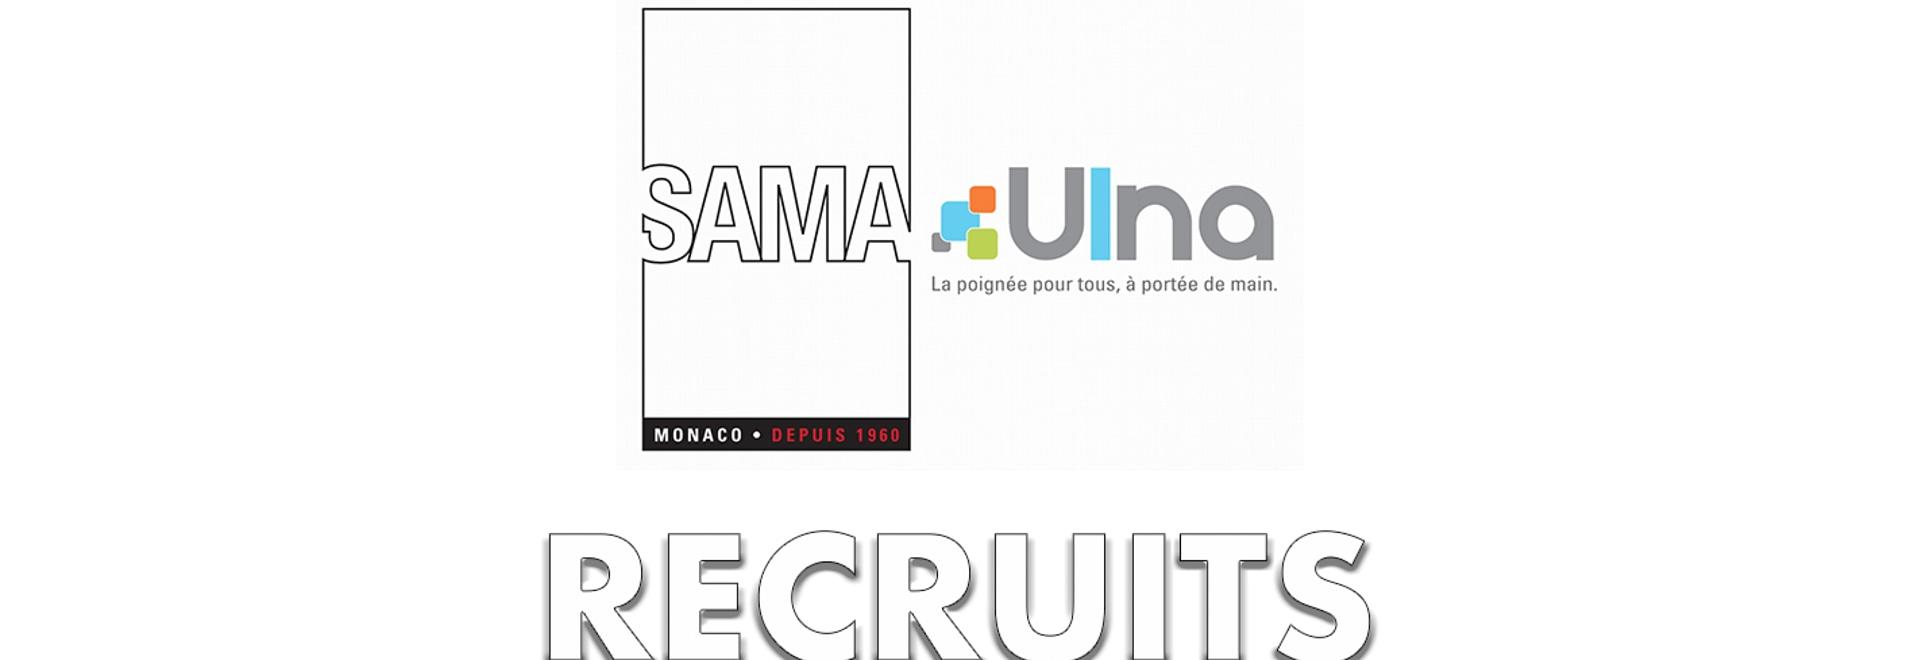 SAMA-ULNA Recruits